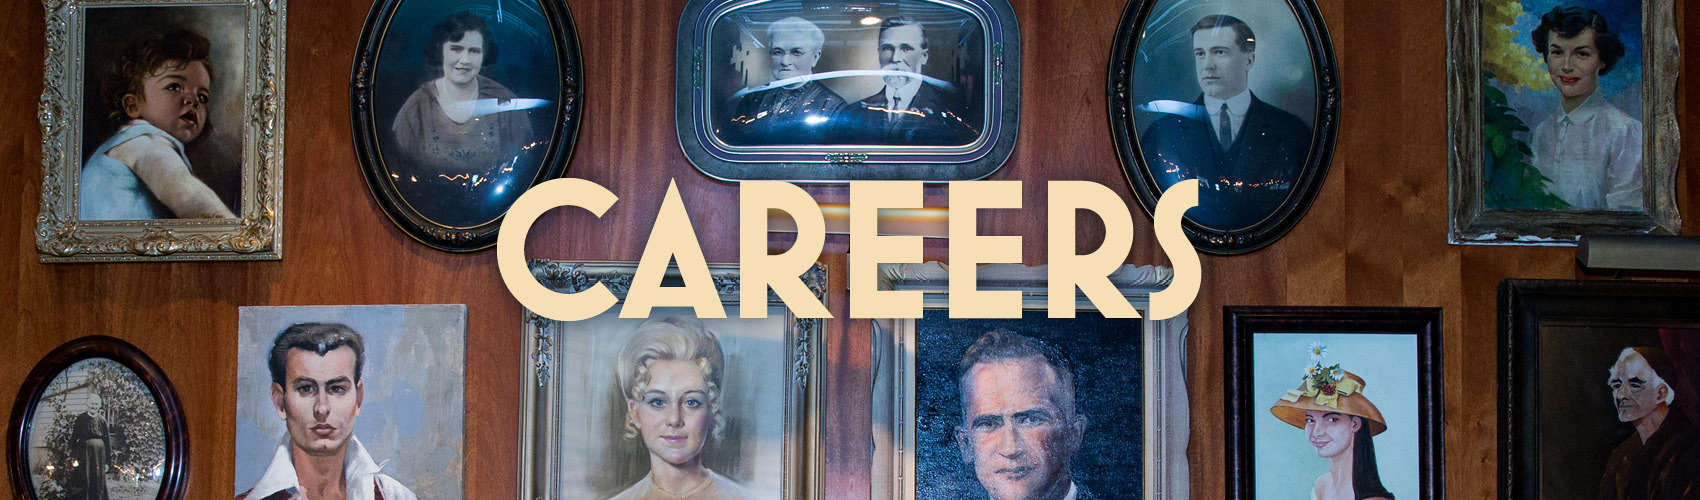 Scaddabush Careers